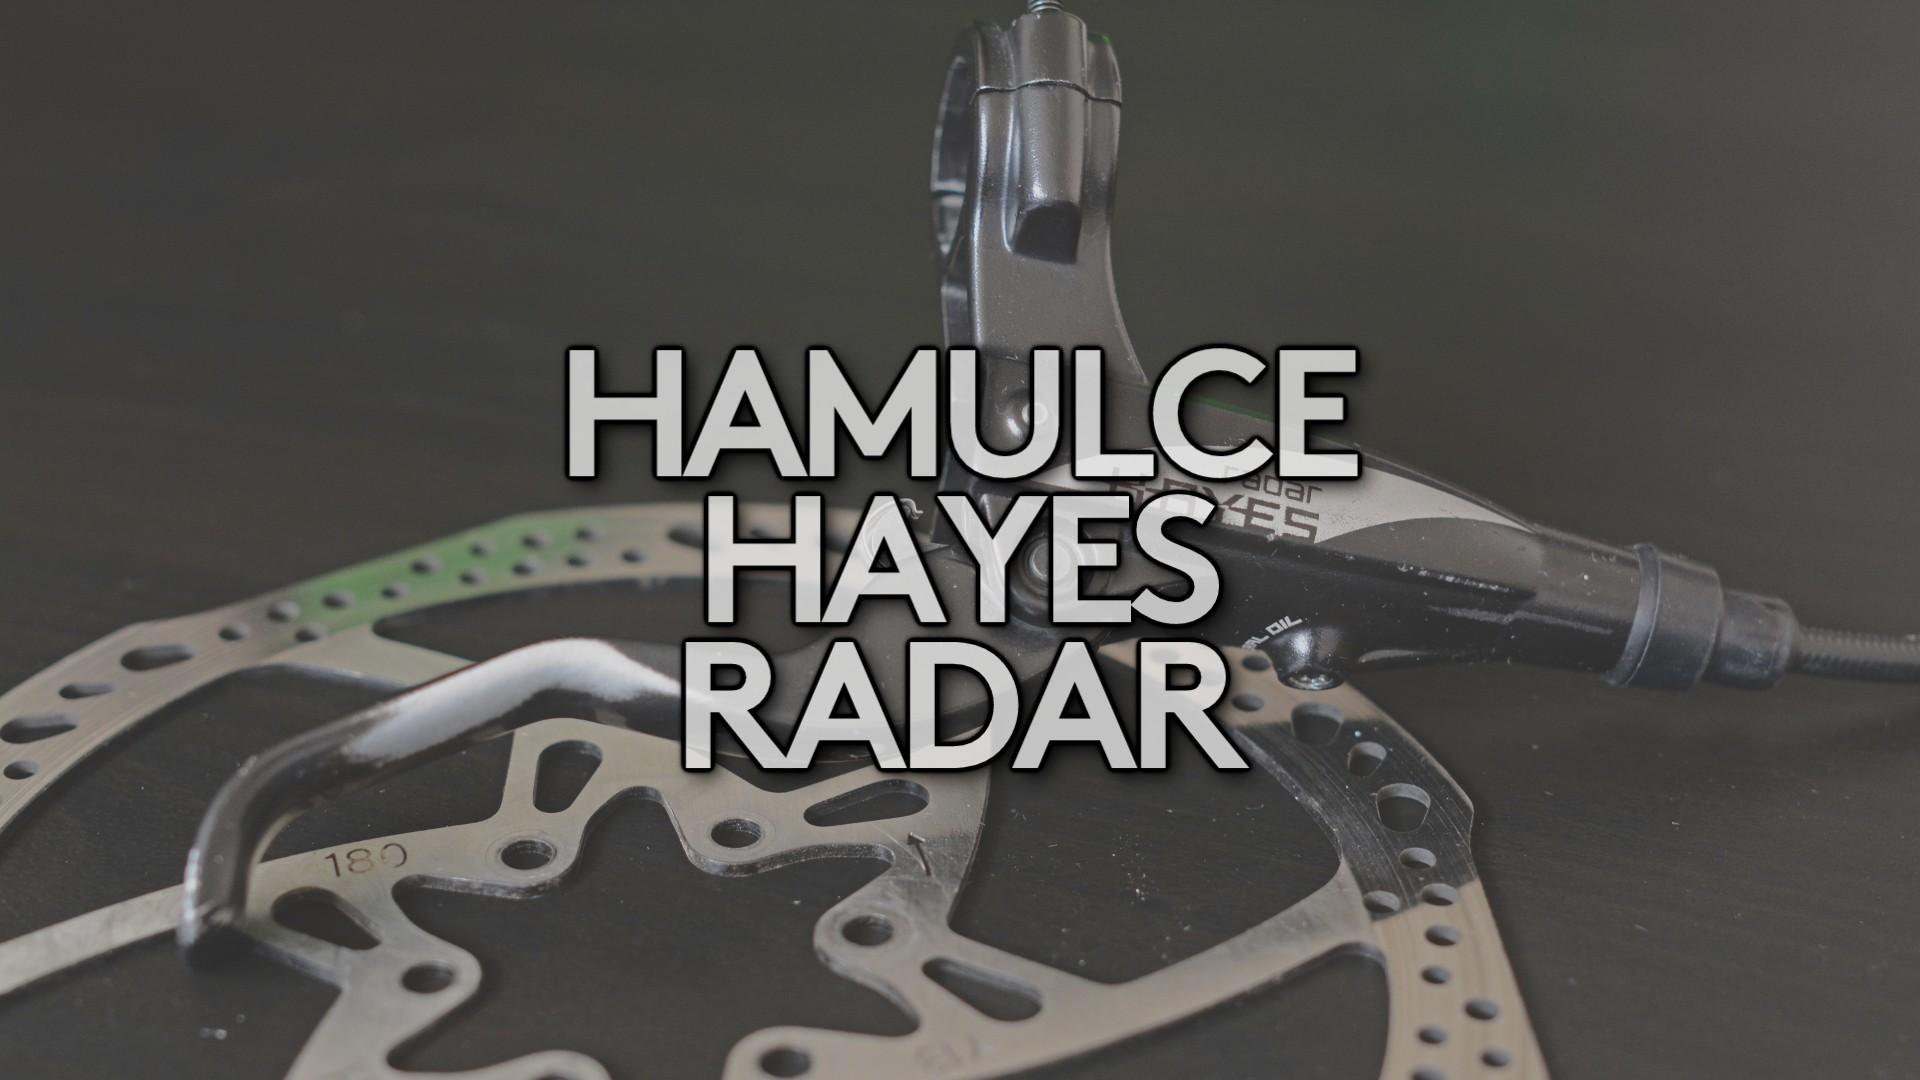 Hamulce Hayes Radar